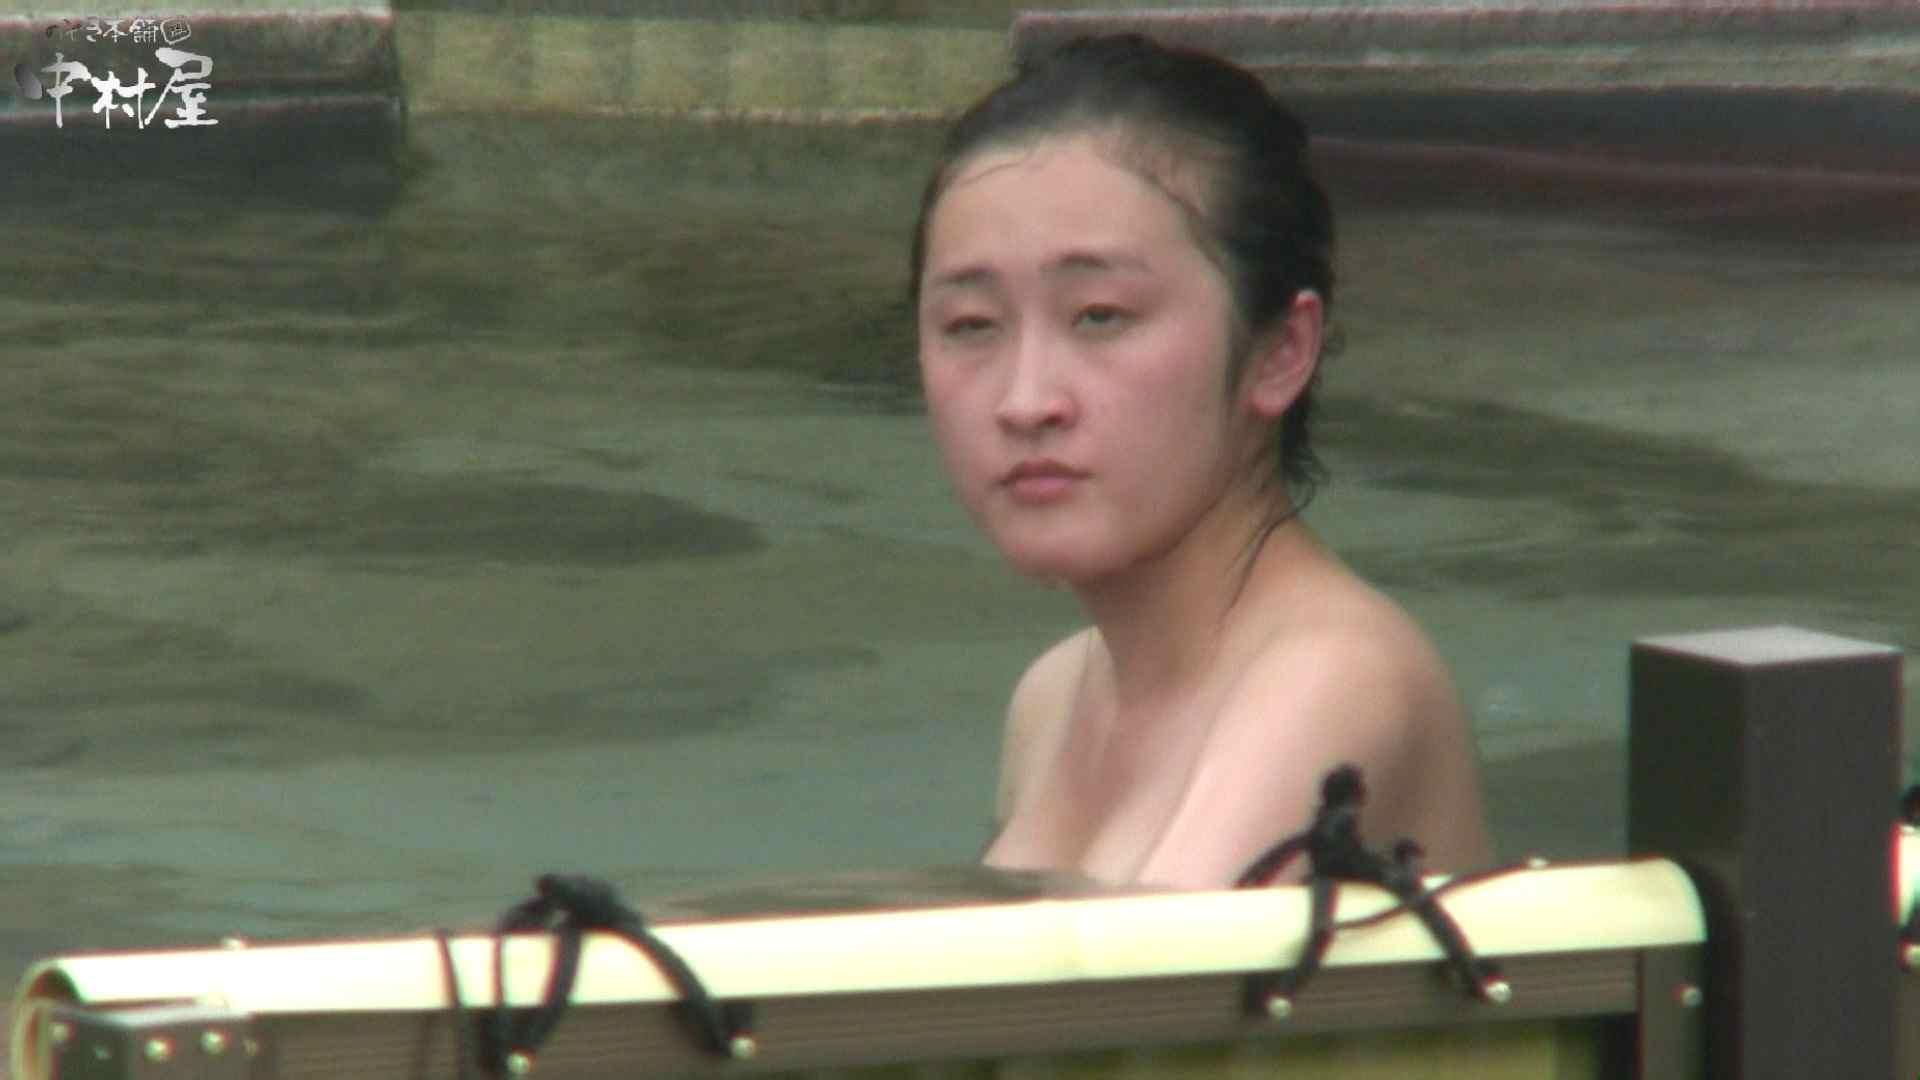 Aquaな露天風呂Vol.949 盗撮   OLセックス  92画像 49